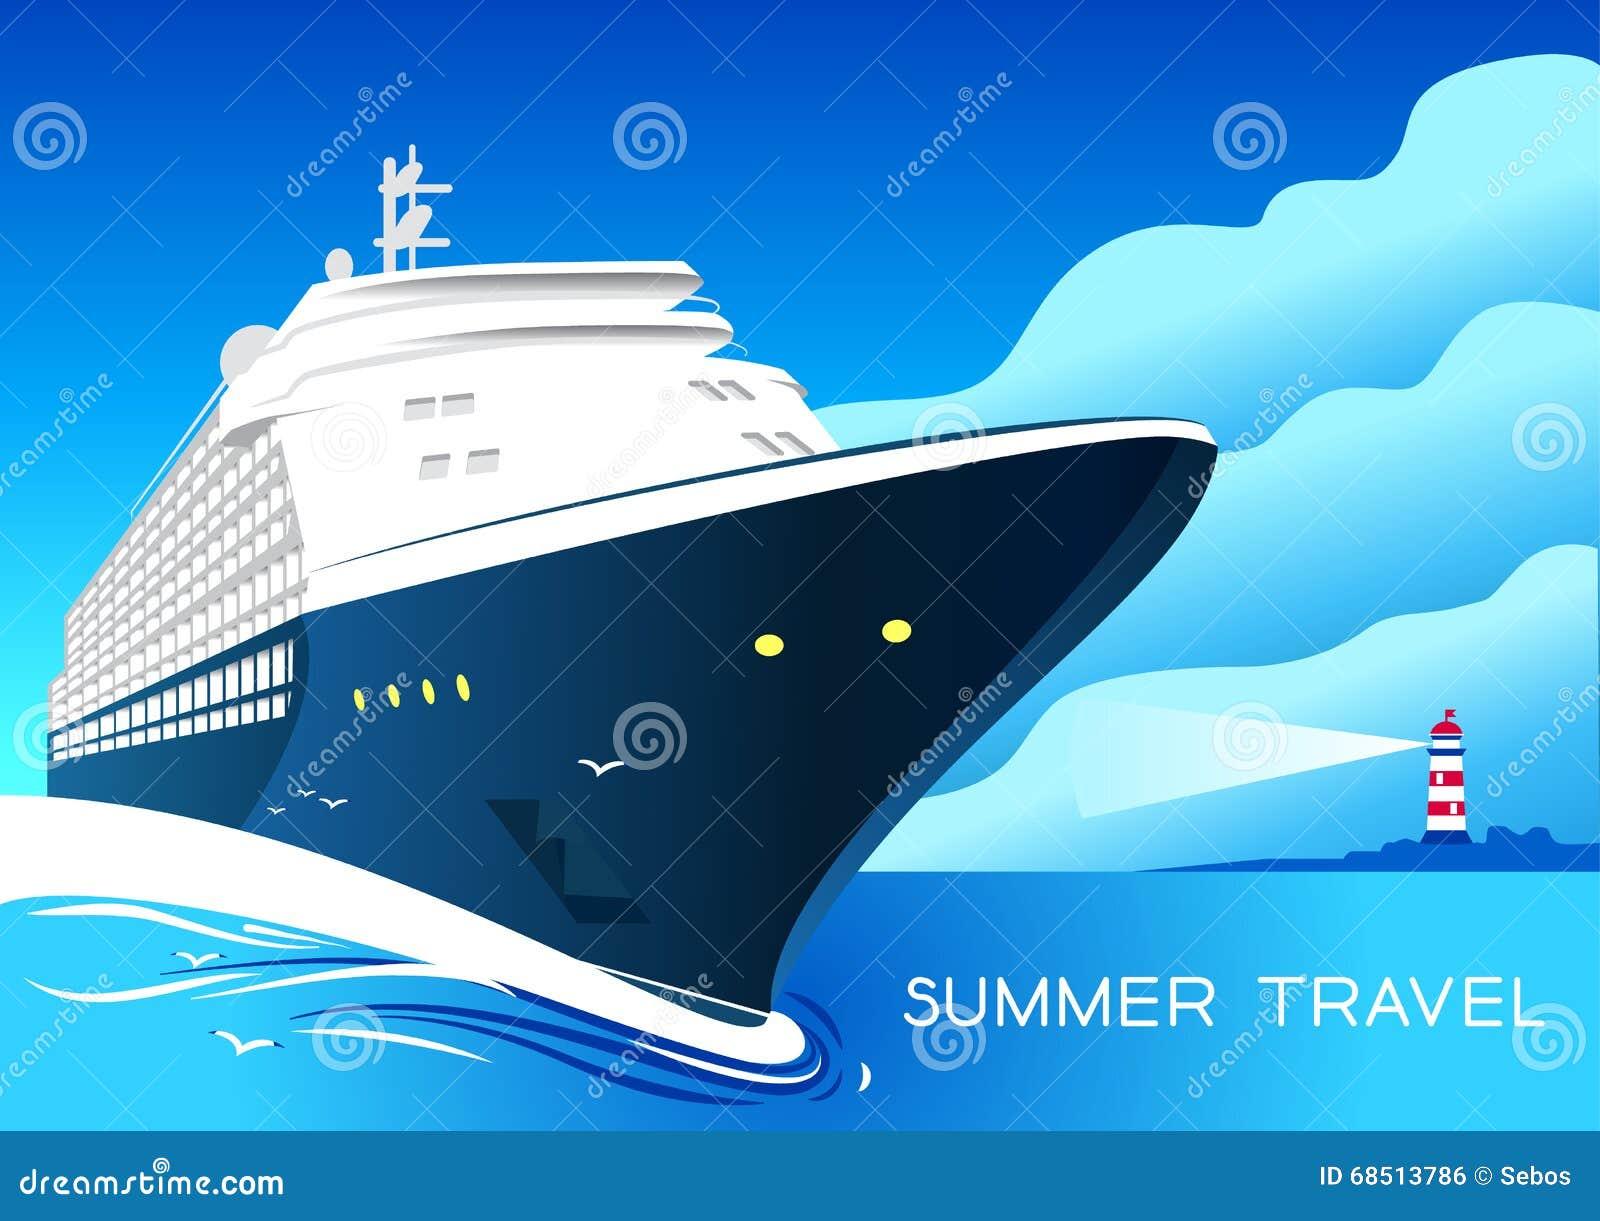 Summer Travel Cruise Ship Vintage Art Deco Poster